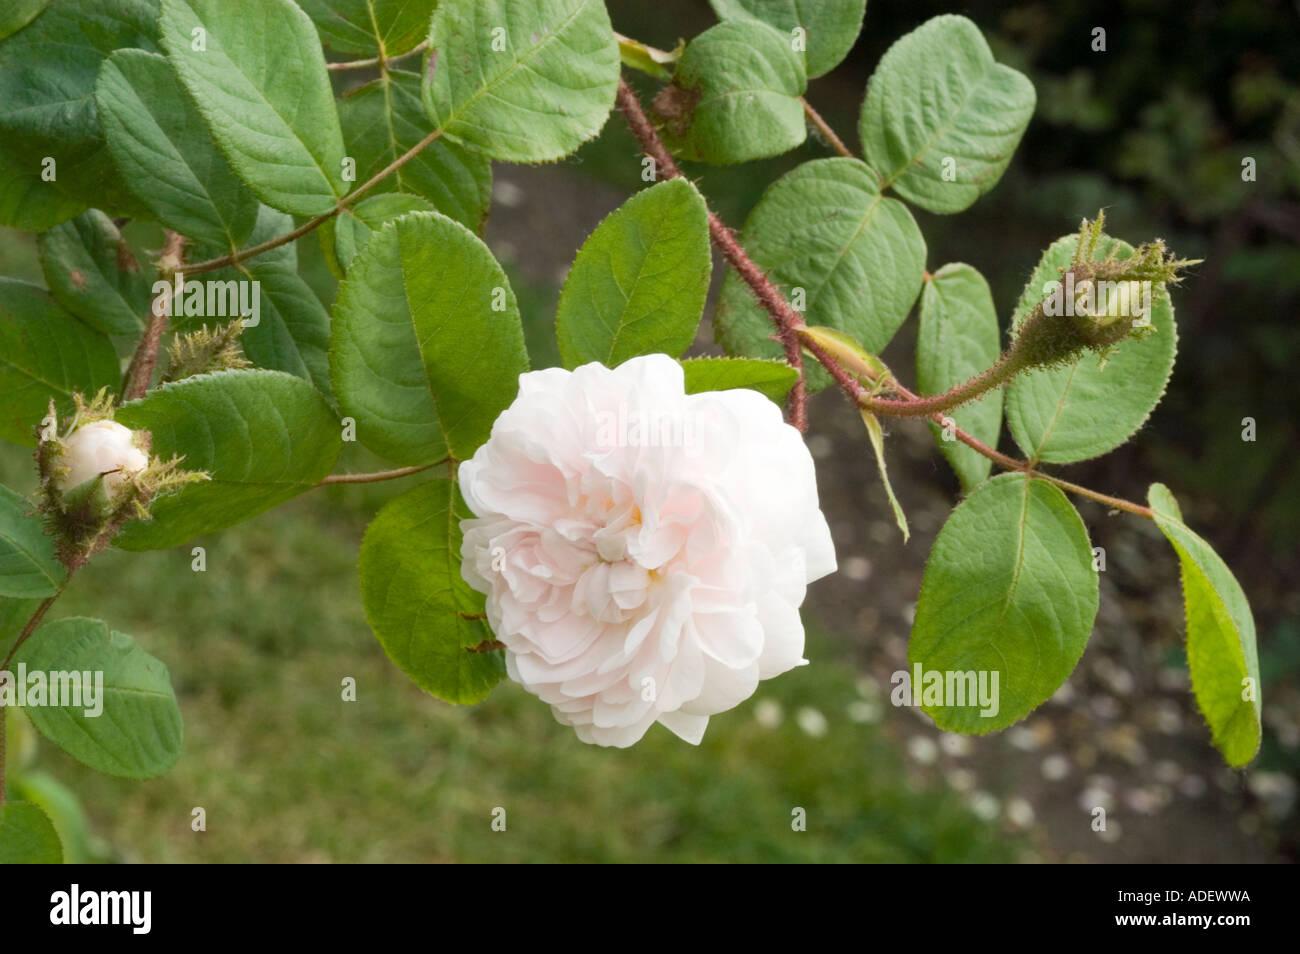 Rose Rosaceae Rosa x bifera remontanty Frau Karl Druschki o Snow Queen o blanco American Beauty o Reine des Neiges Foto de stock